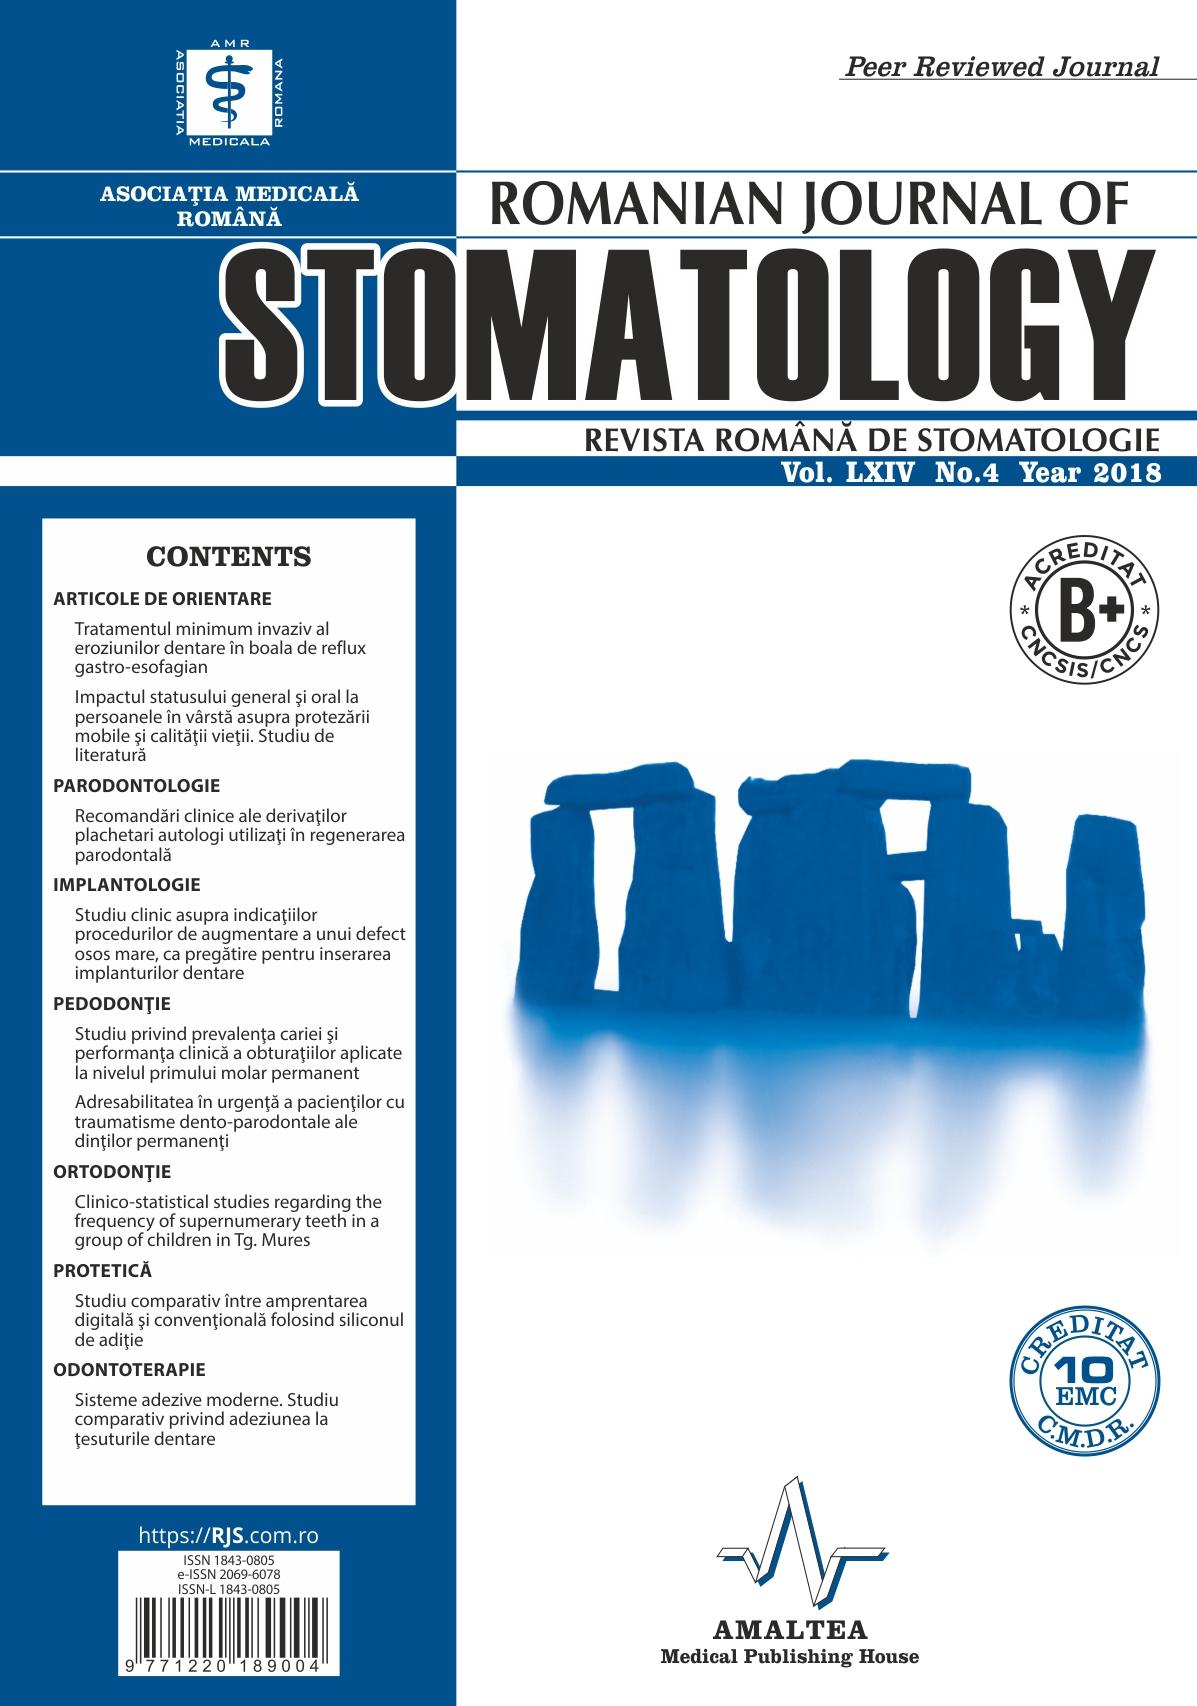 Revista Romana de STOMATOLOGIE - Romanian Journal of Stomatology, Vol. LXIV, Nr. 4, An 2018